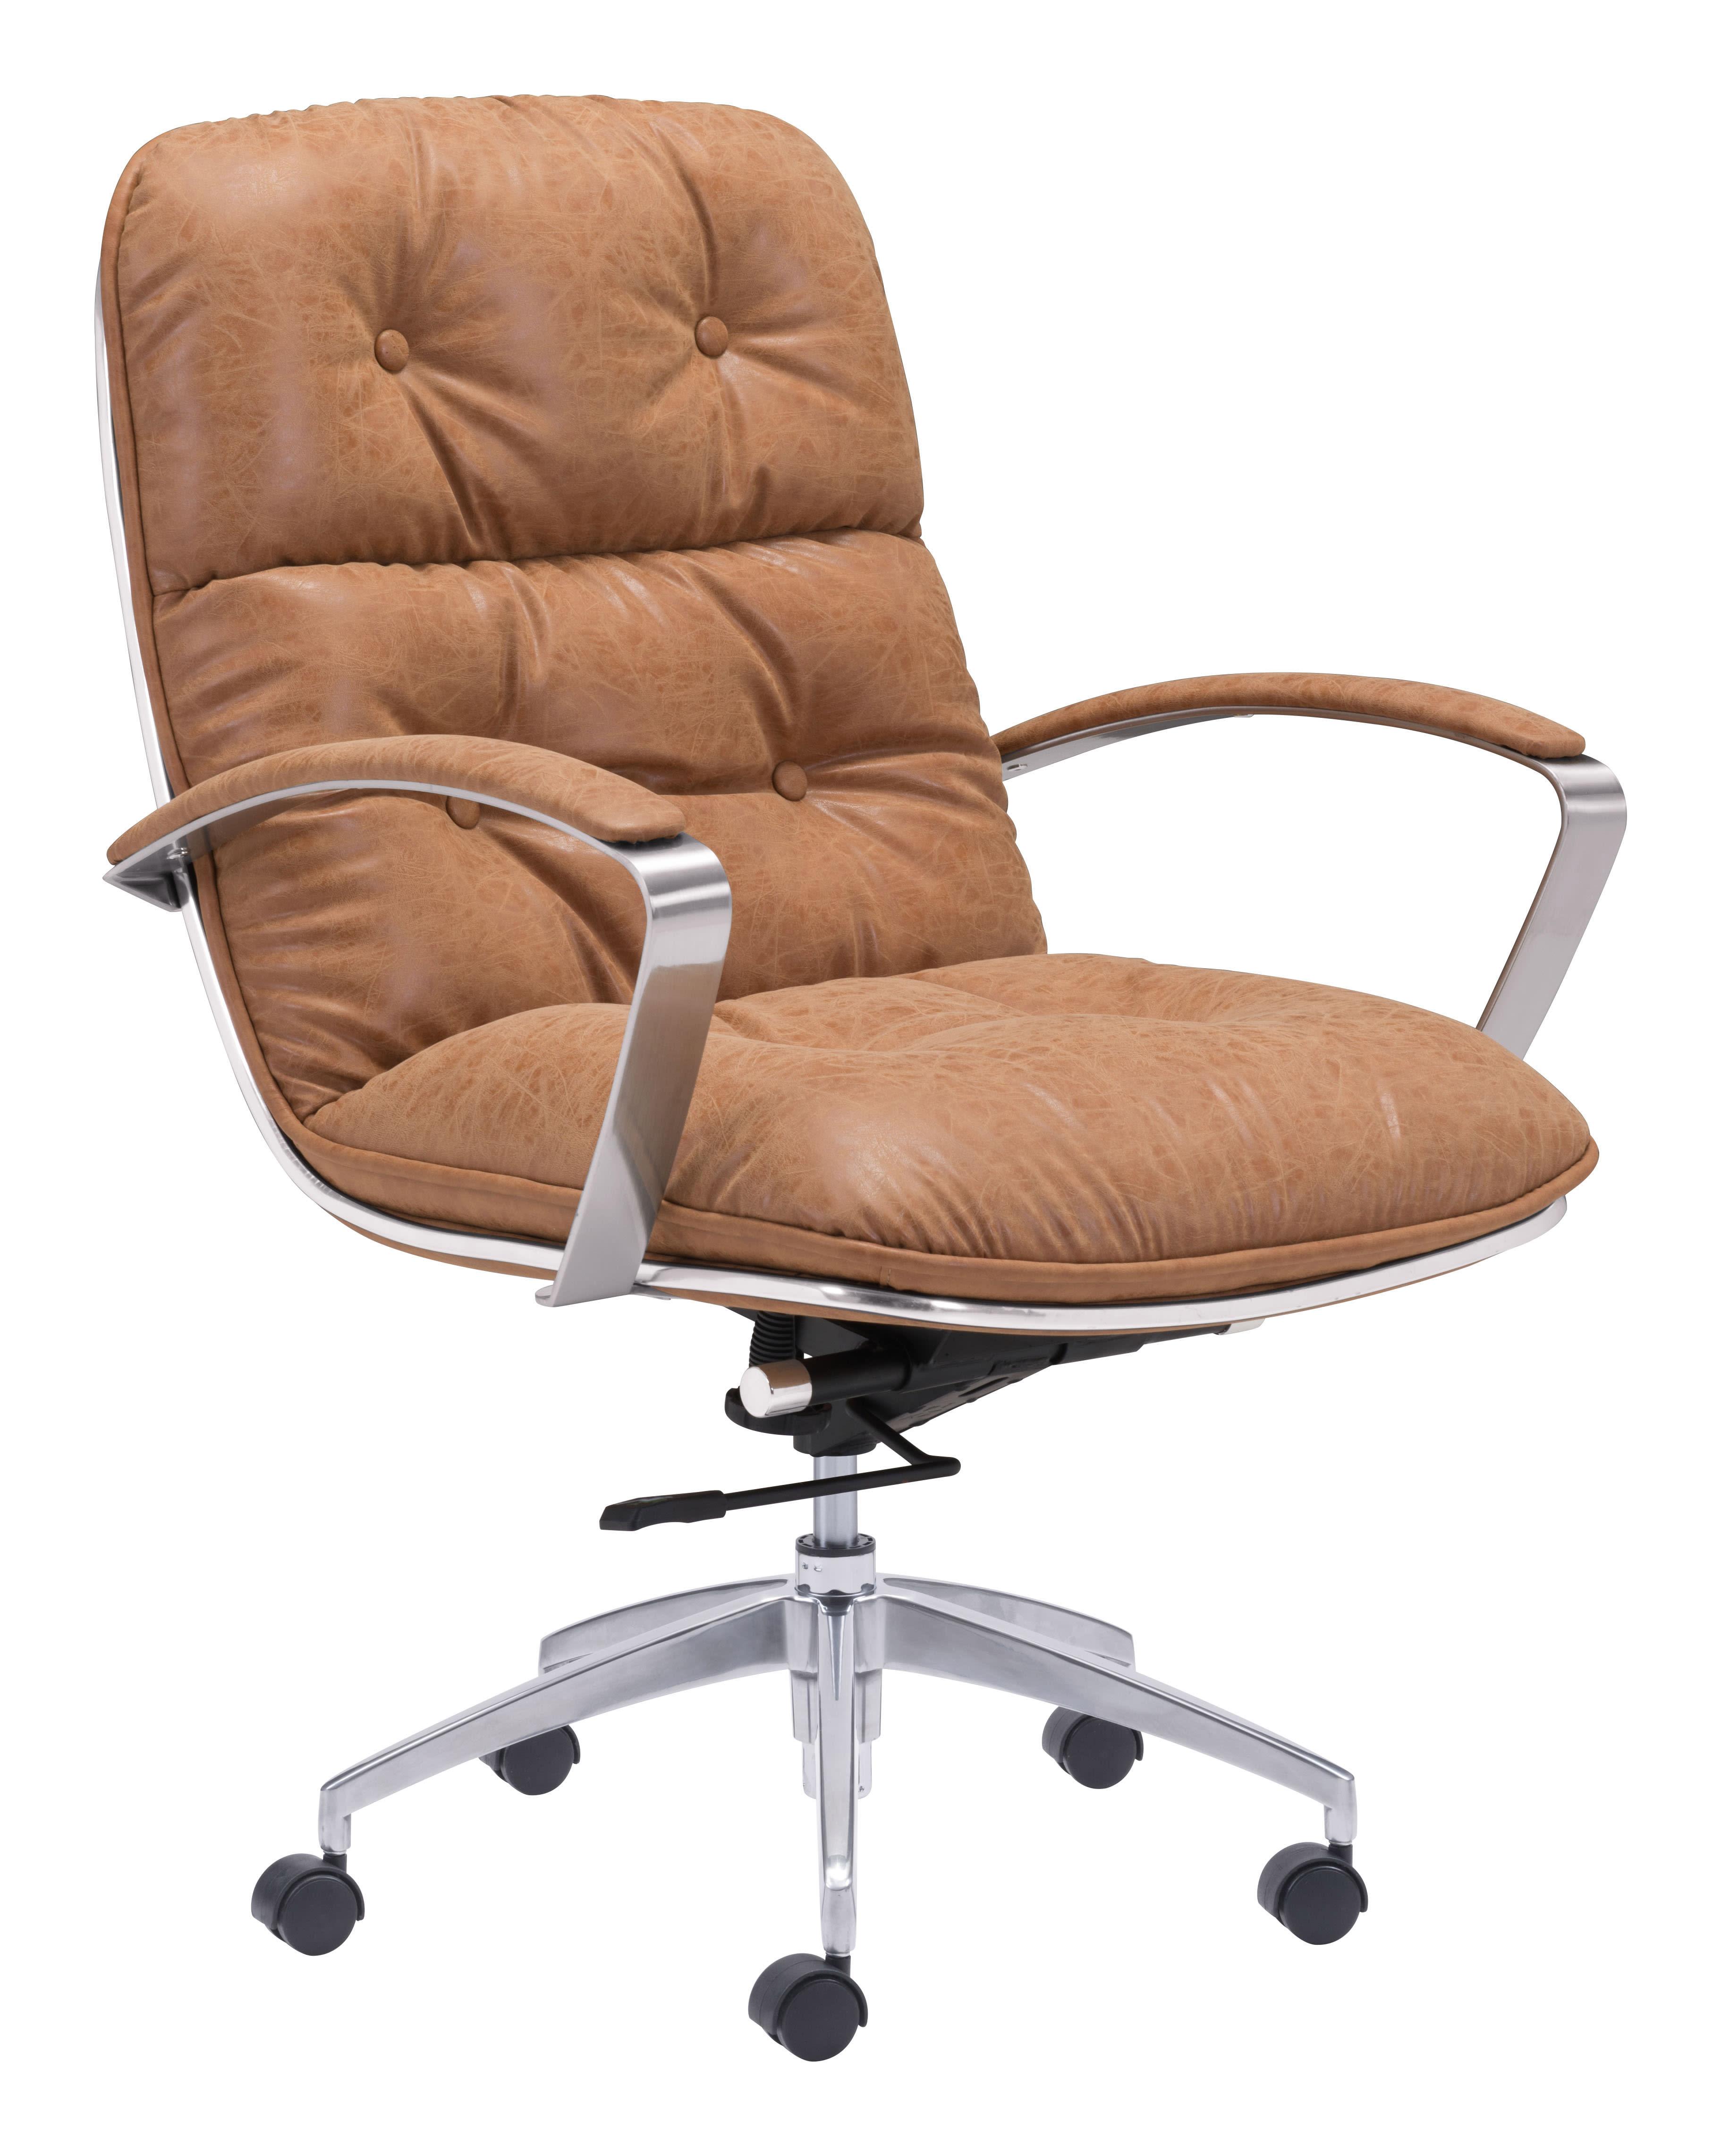 Wondrous Zuo Modern 100446 Evergreenethics Interior Chair Design Evergreenethicsorg